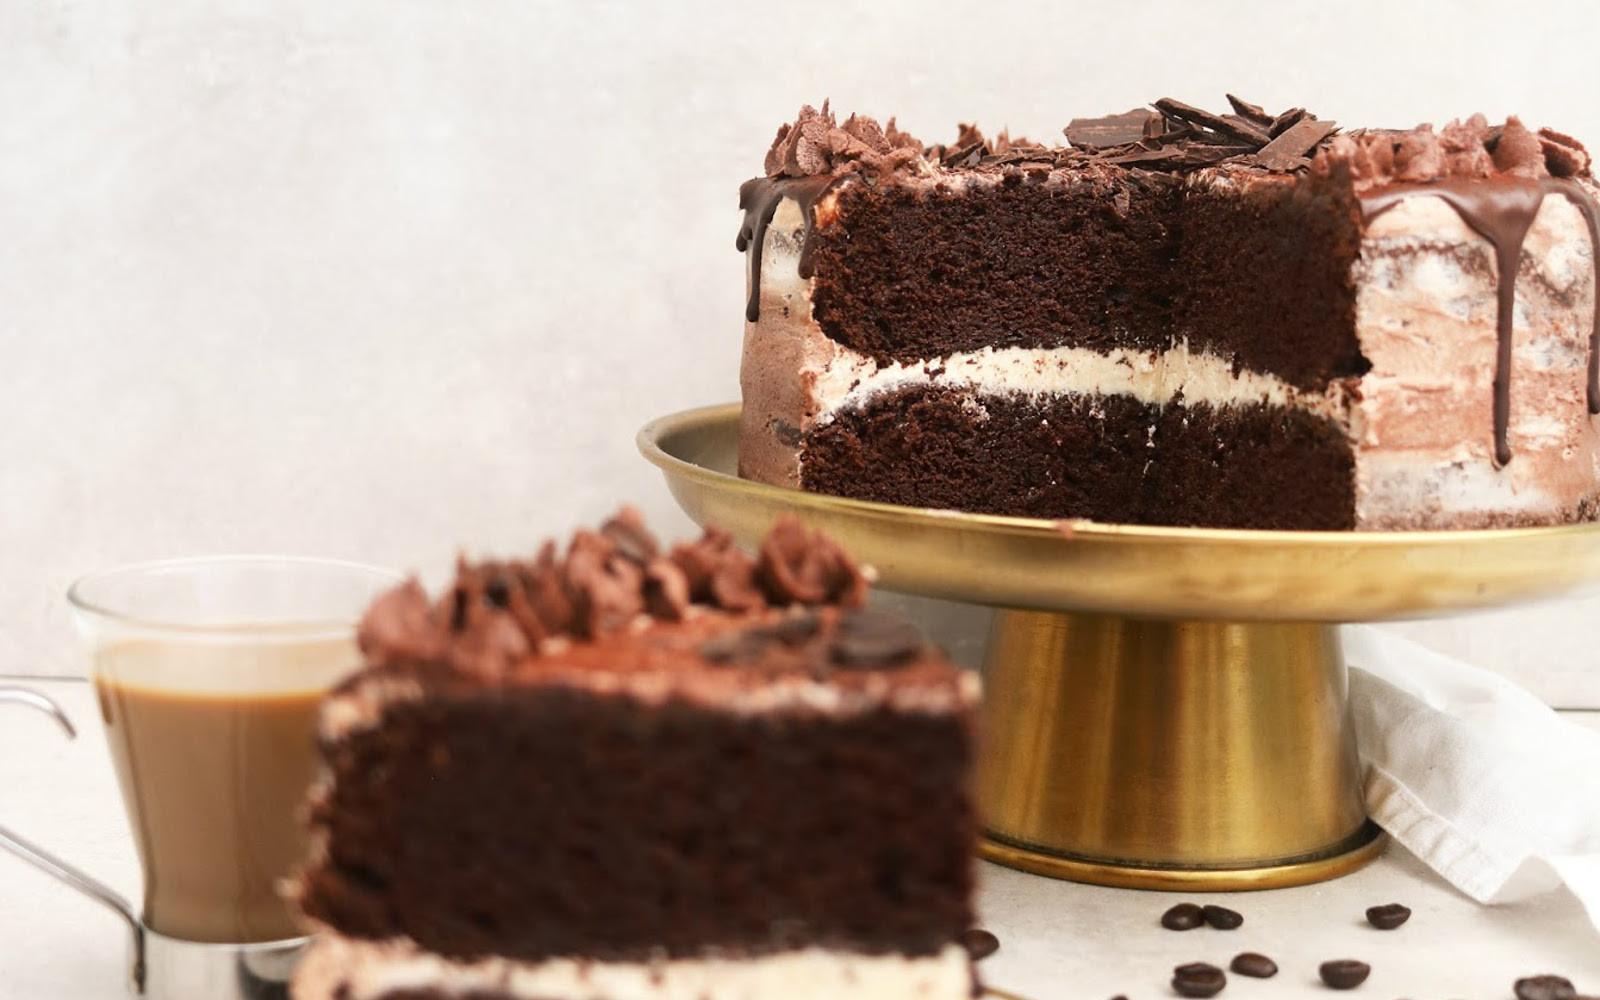 Vegan Coffee Recipes  Chocolate Coffee Cake [Vegan Gluten Free] e Green